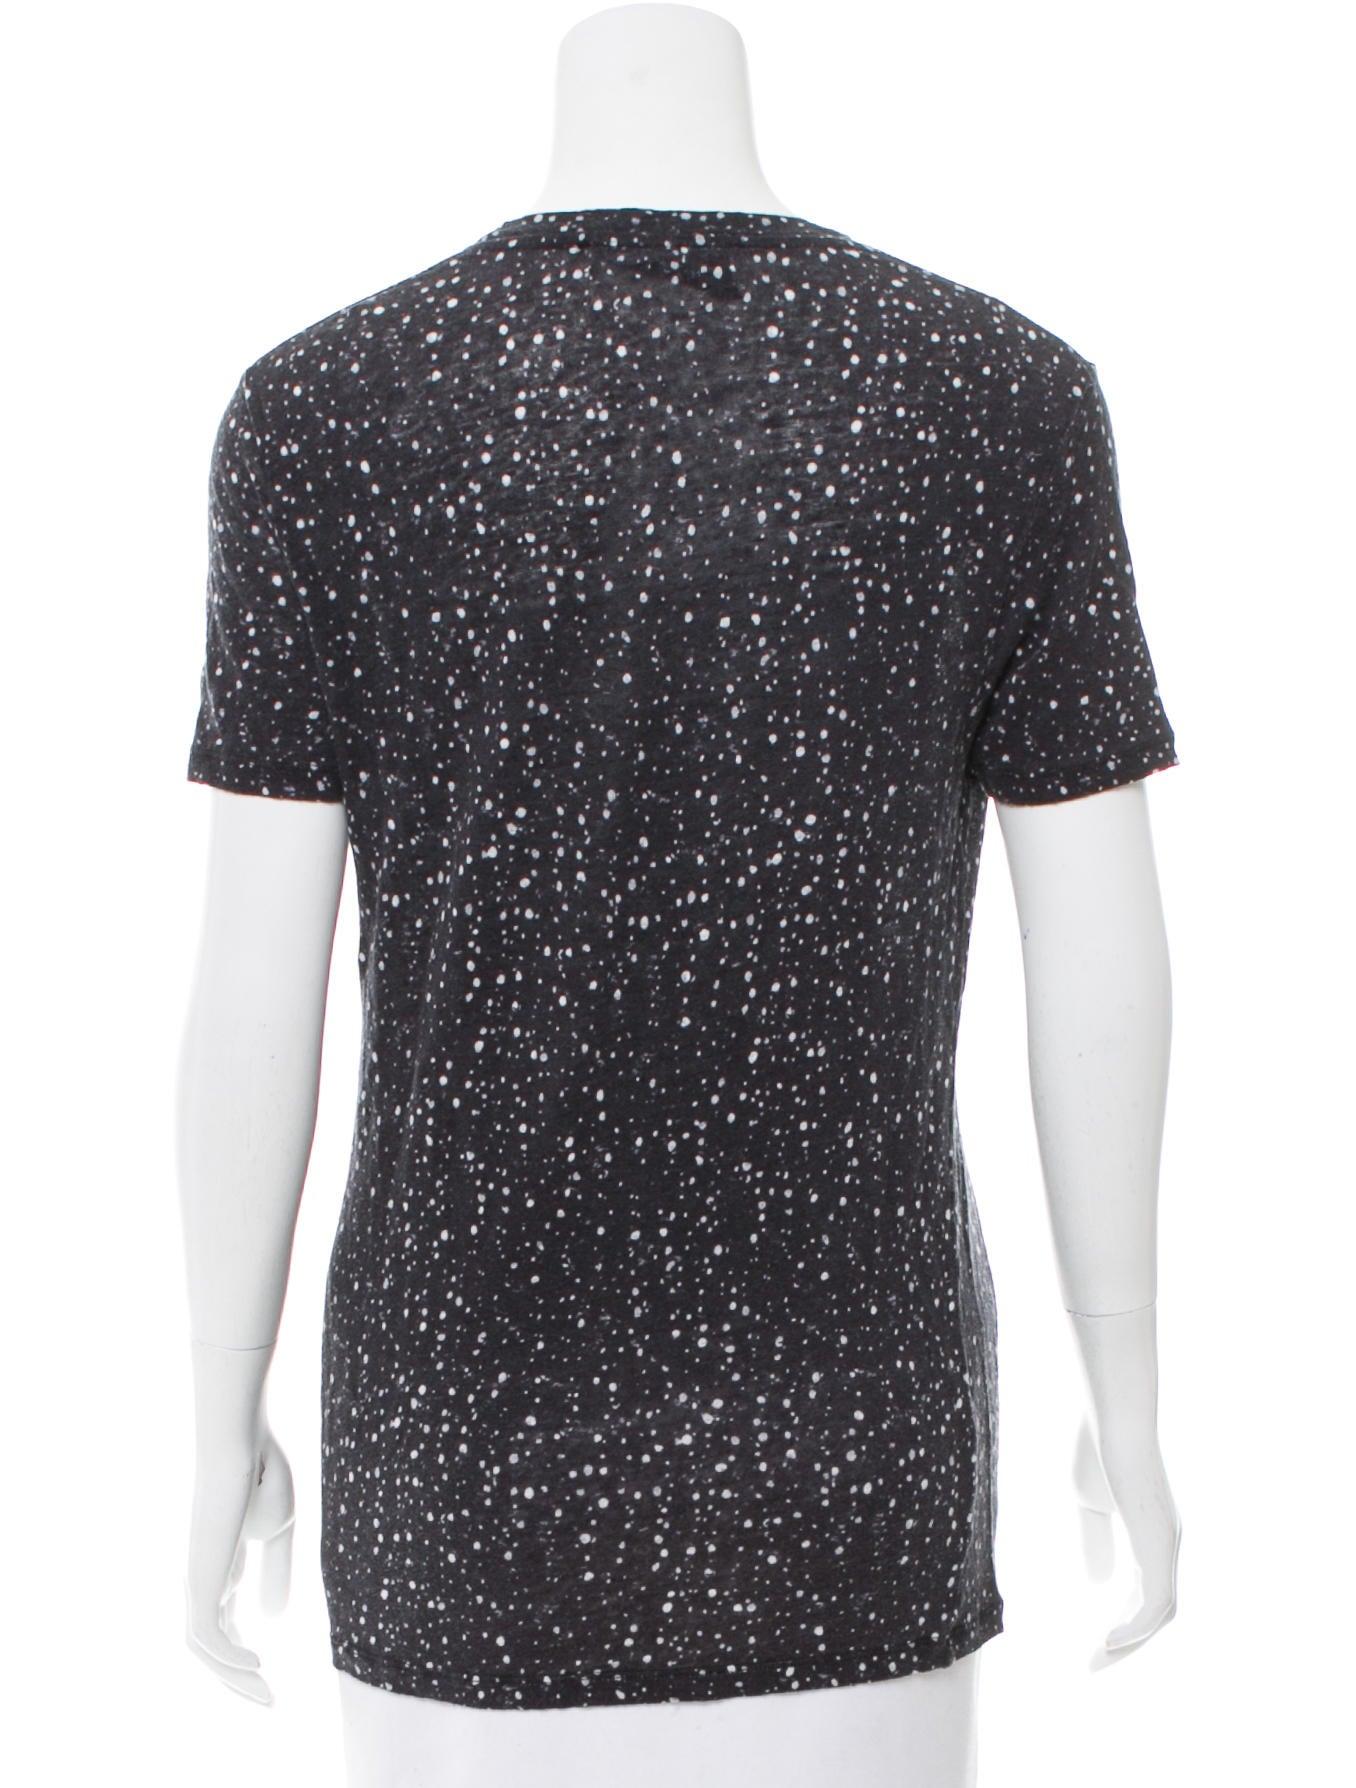 Iro Short Sleeve Printed T Shirt Clothing Wir32961